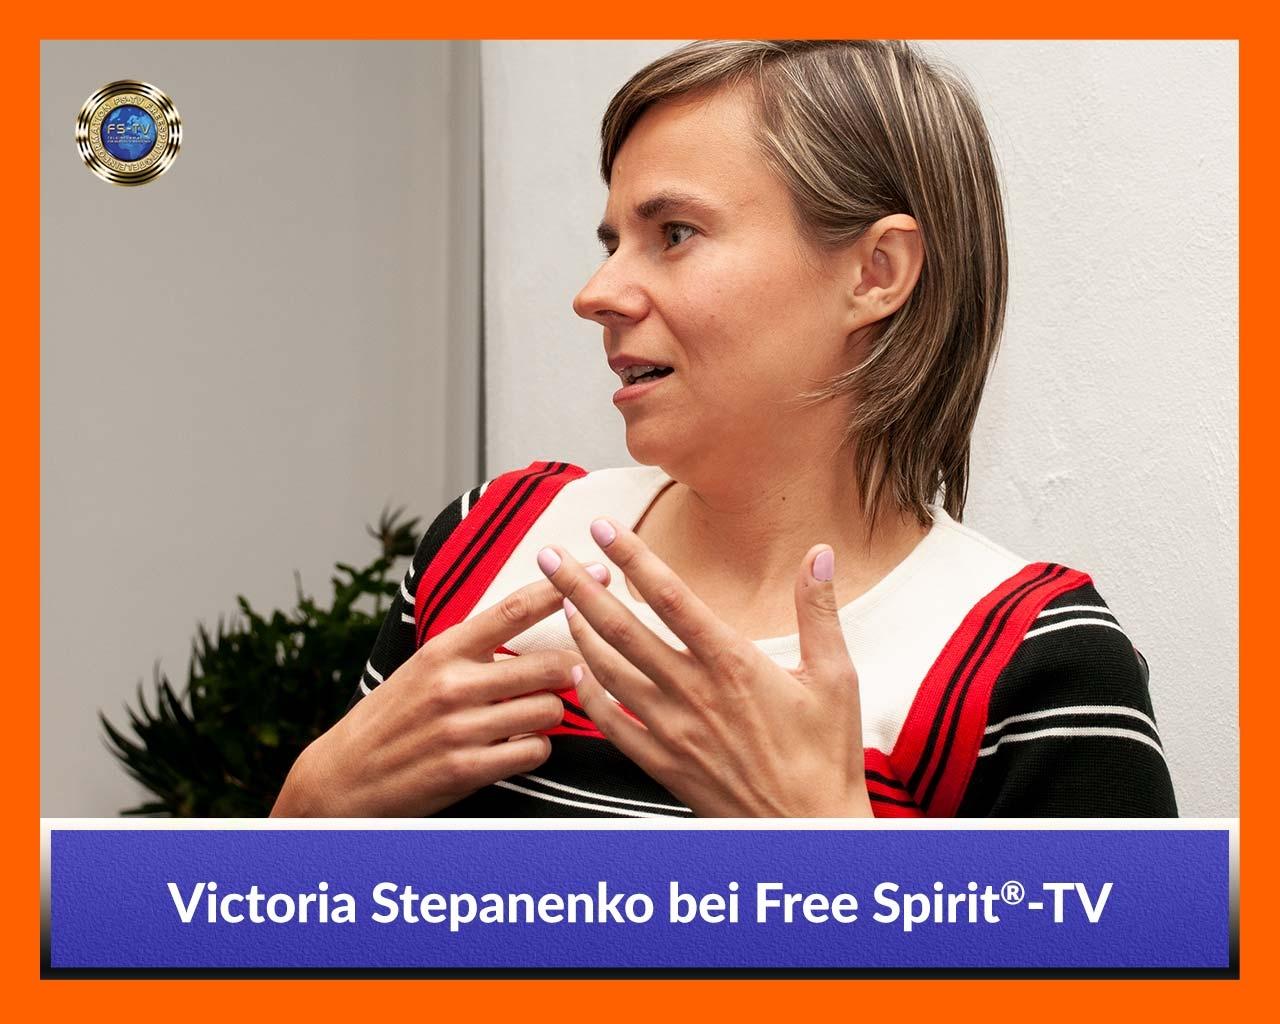 Galleriebild-Victoria-Stepanenko-06